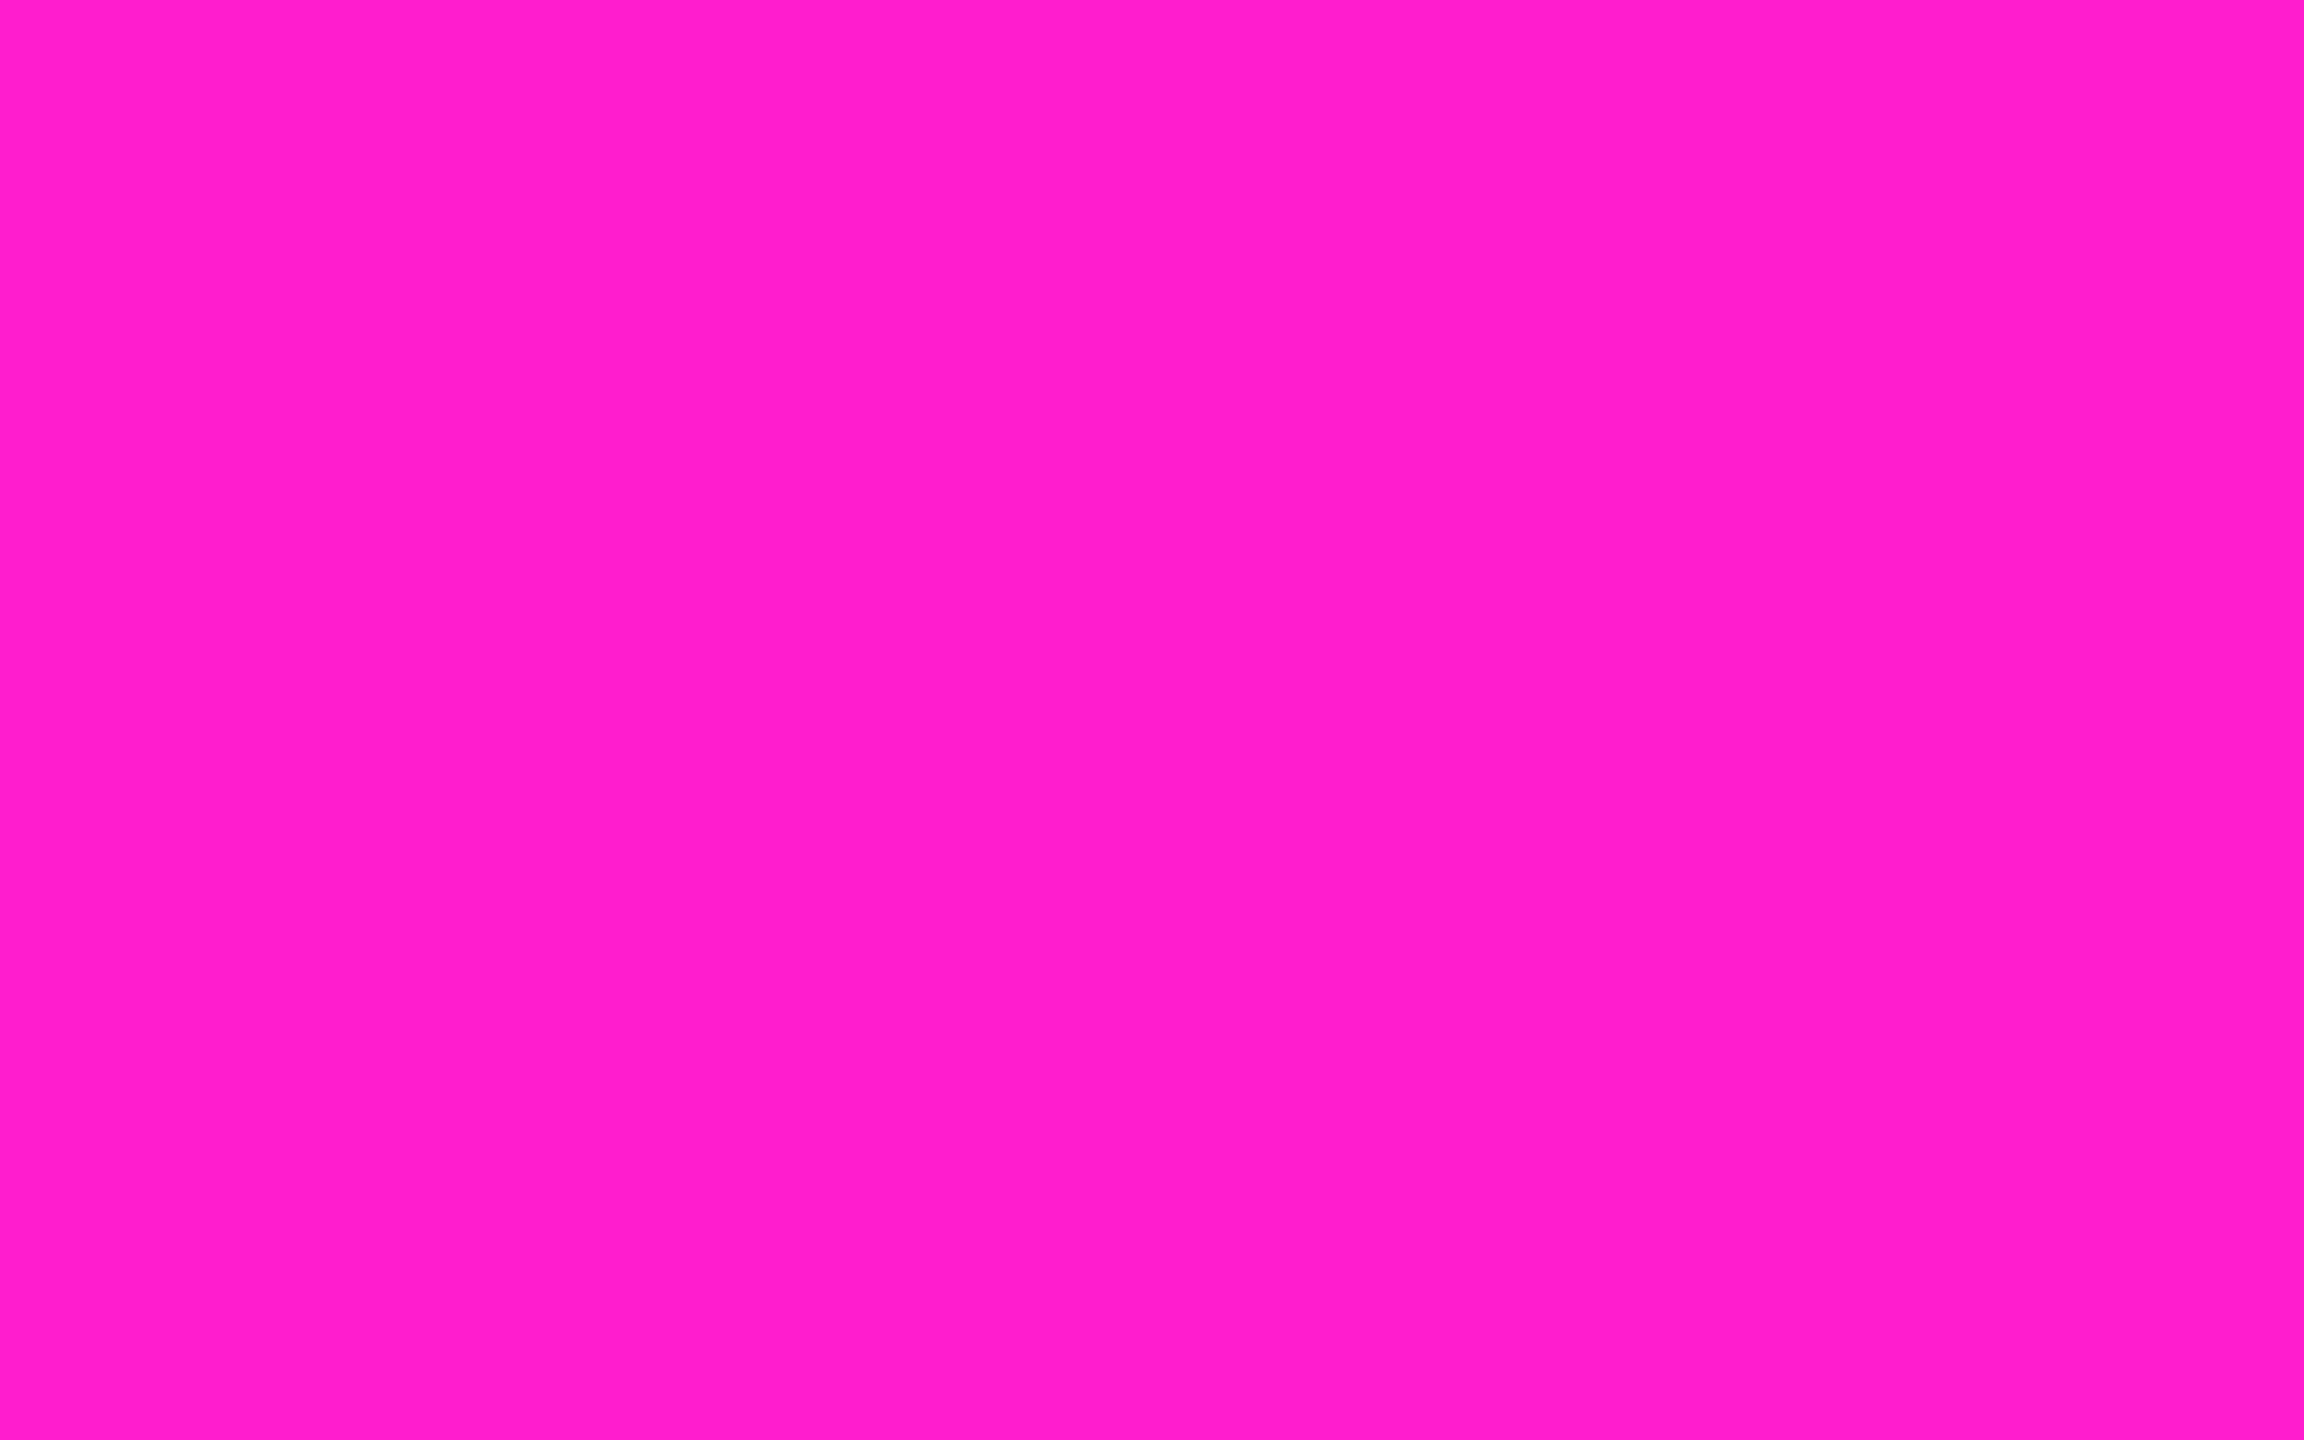 2304x1440 Hot Magenta Solid Color Background